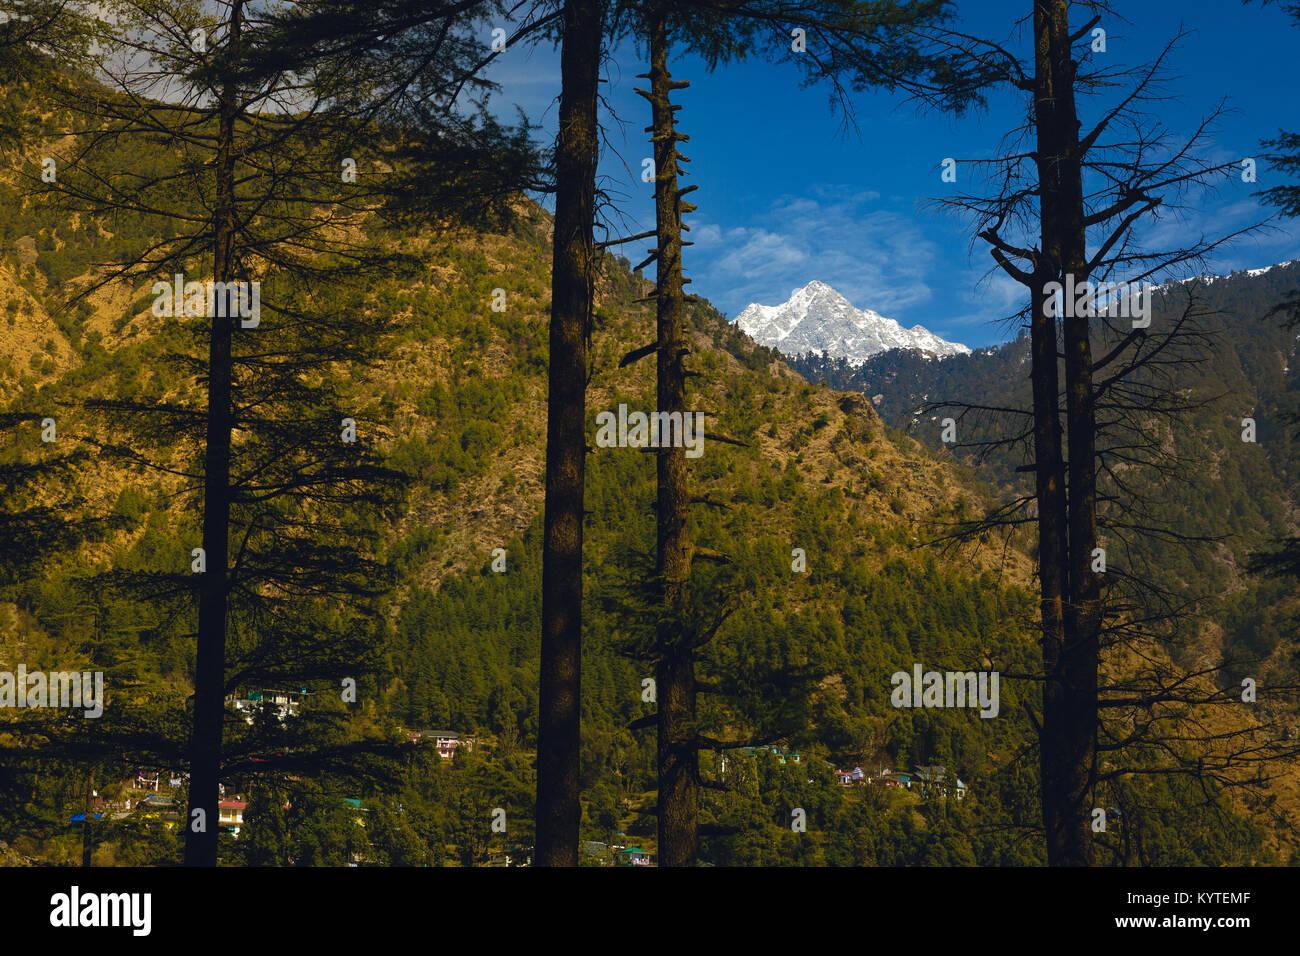 Triund peak in Dhauladhar ranges as seen from Dharamkot, Mcleodganj, Dharamsala, Himachal pradesh, India. Blue skies, - Stock Image